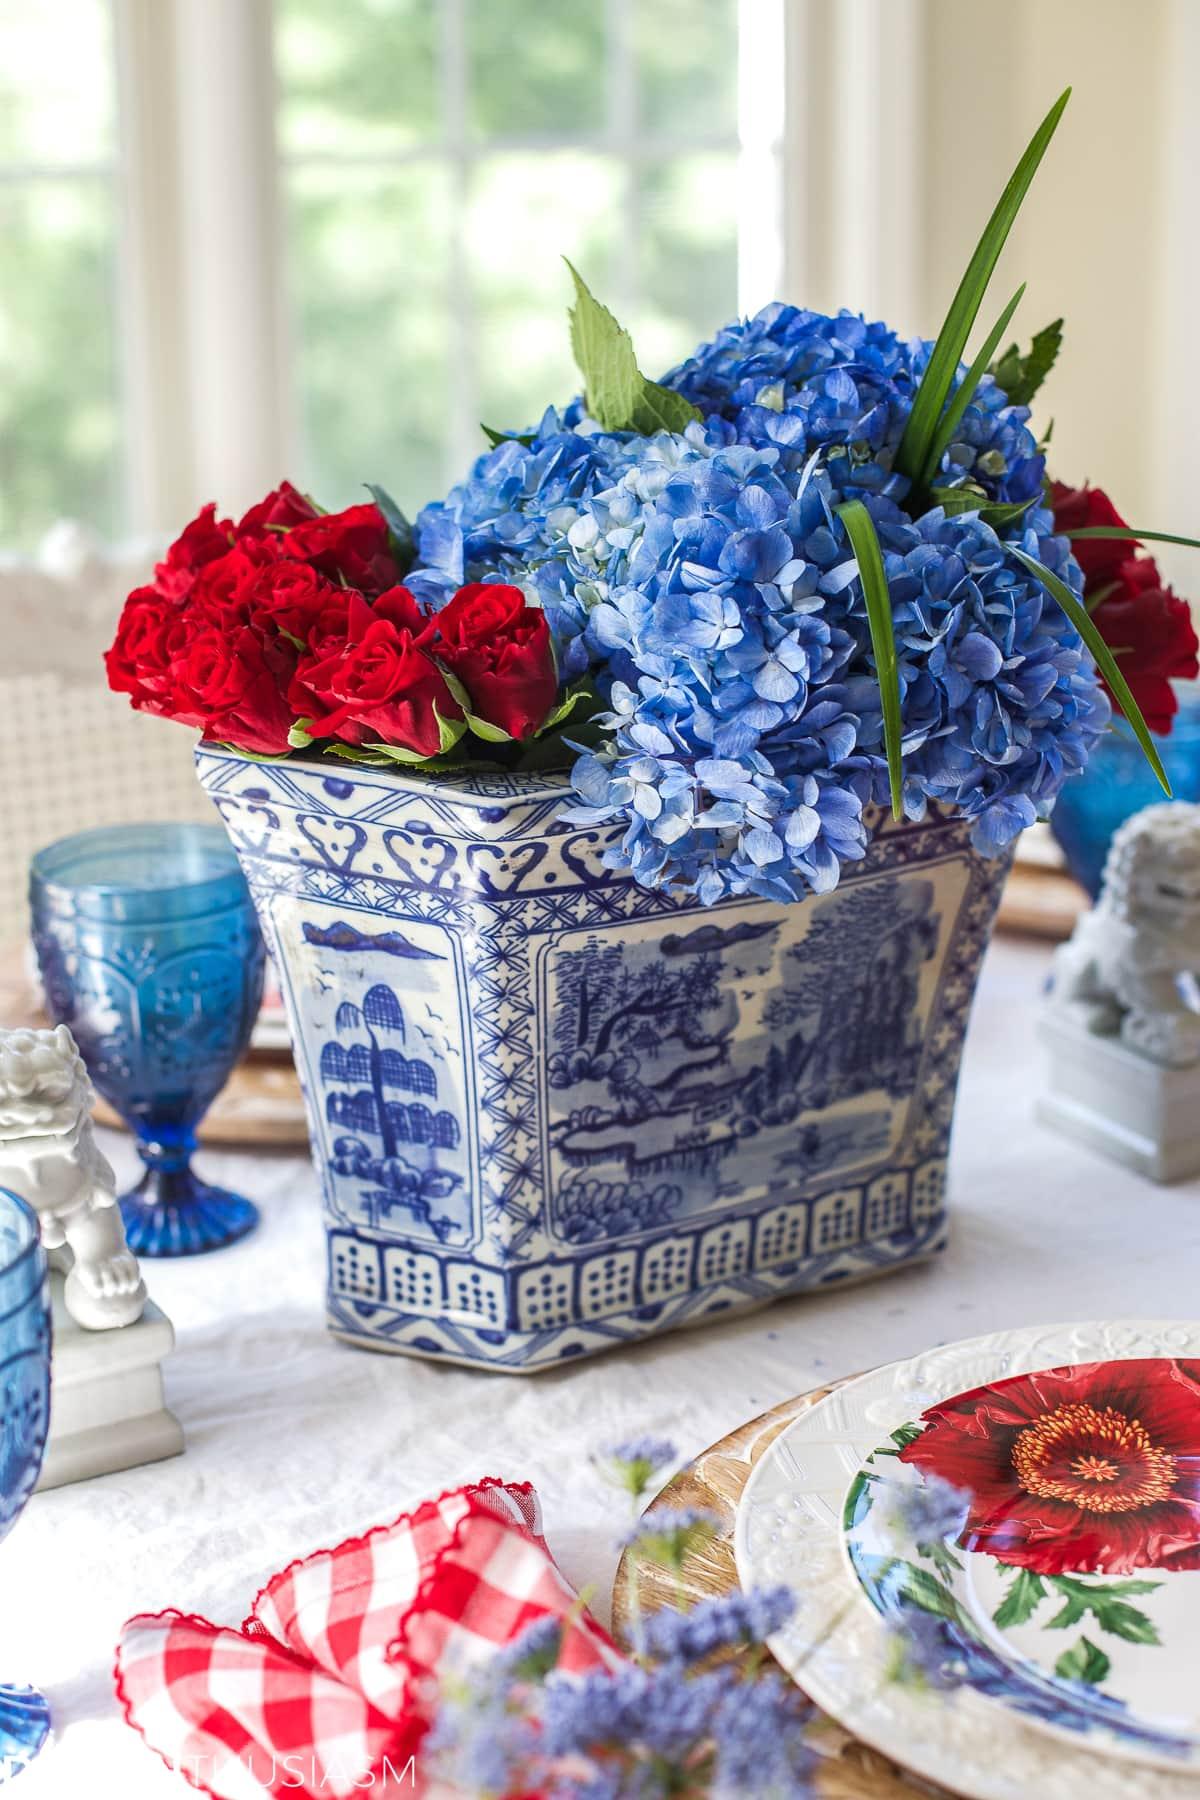 Garden party decorations | Tabletop tips for summer entertaining - designthusiasm.com